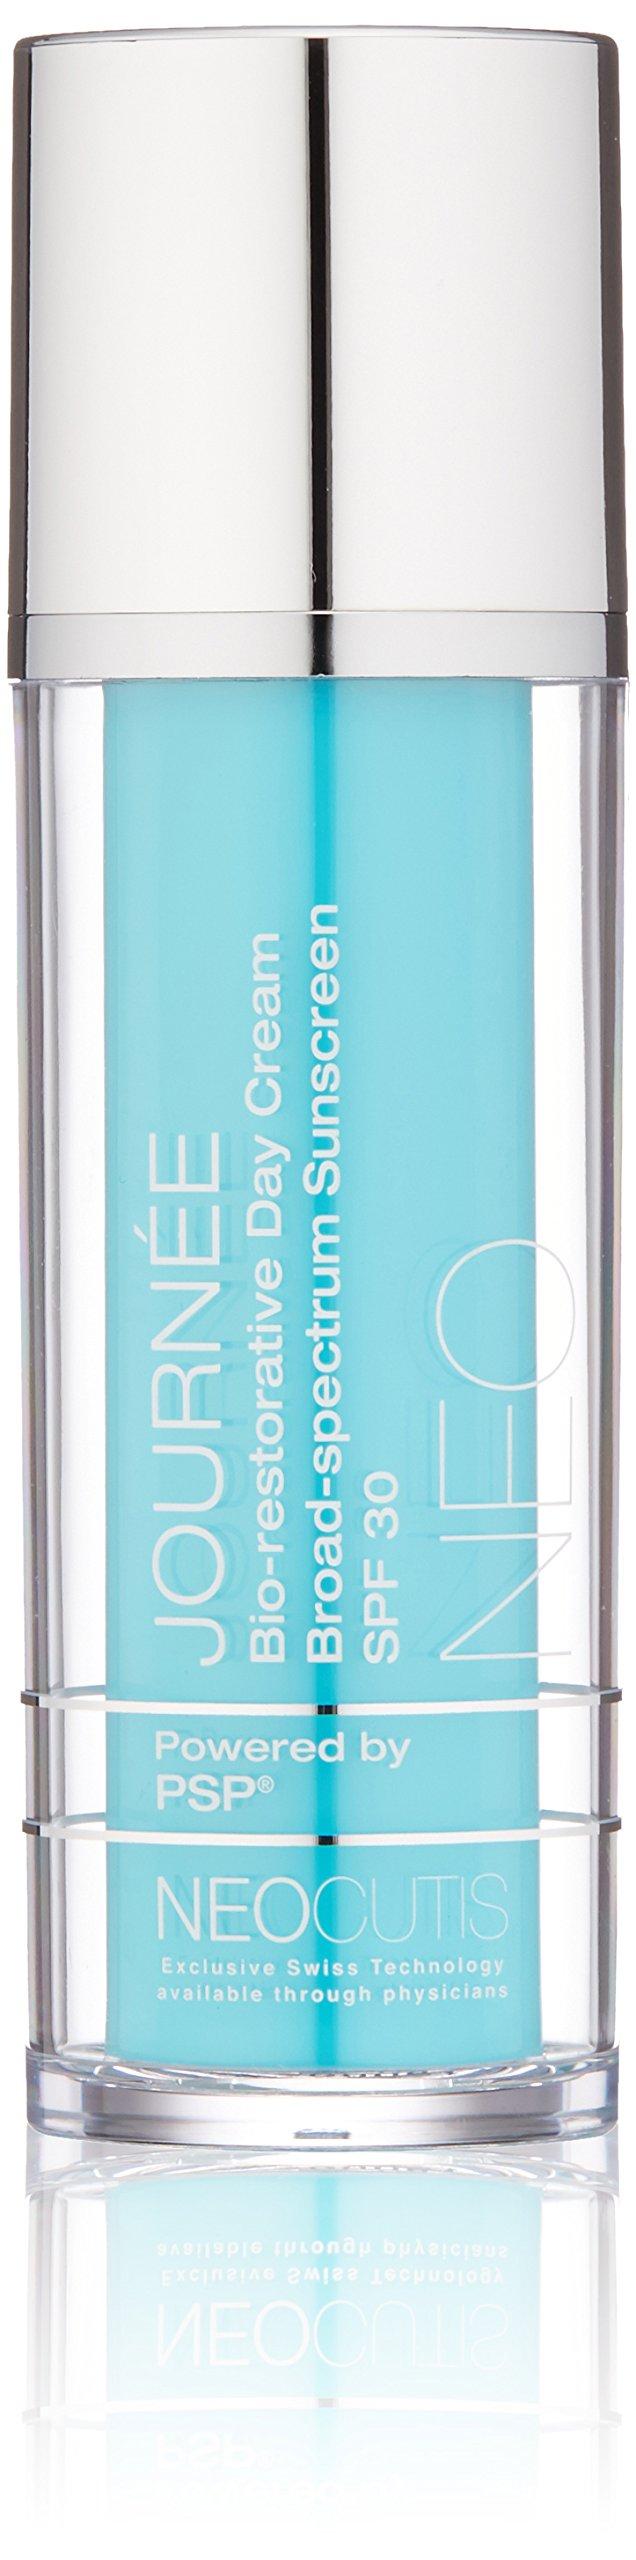 Neocutis SPF 30 Journee Bio-Restorative Day Cream, 1.69 Fluid Ounce